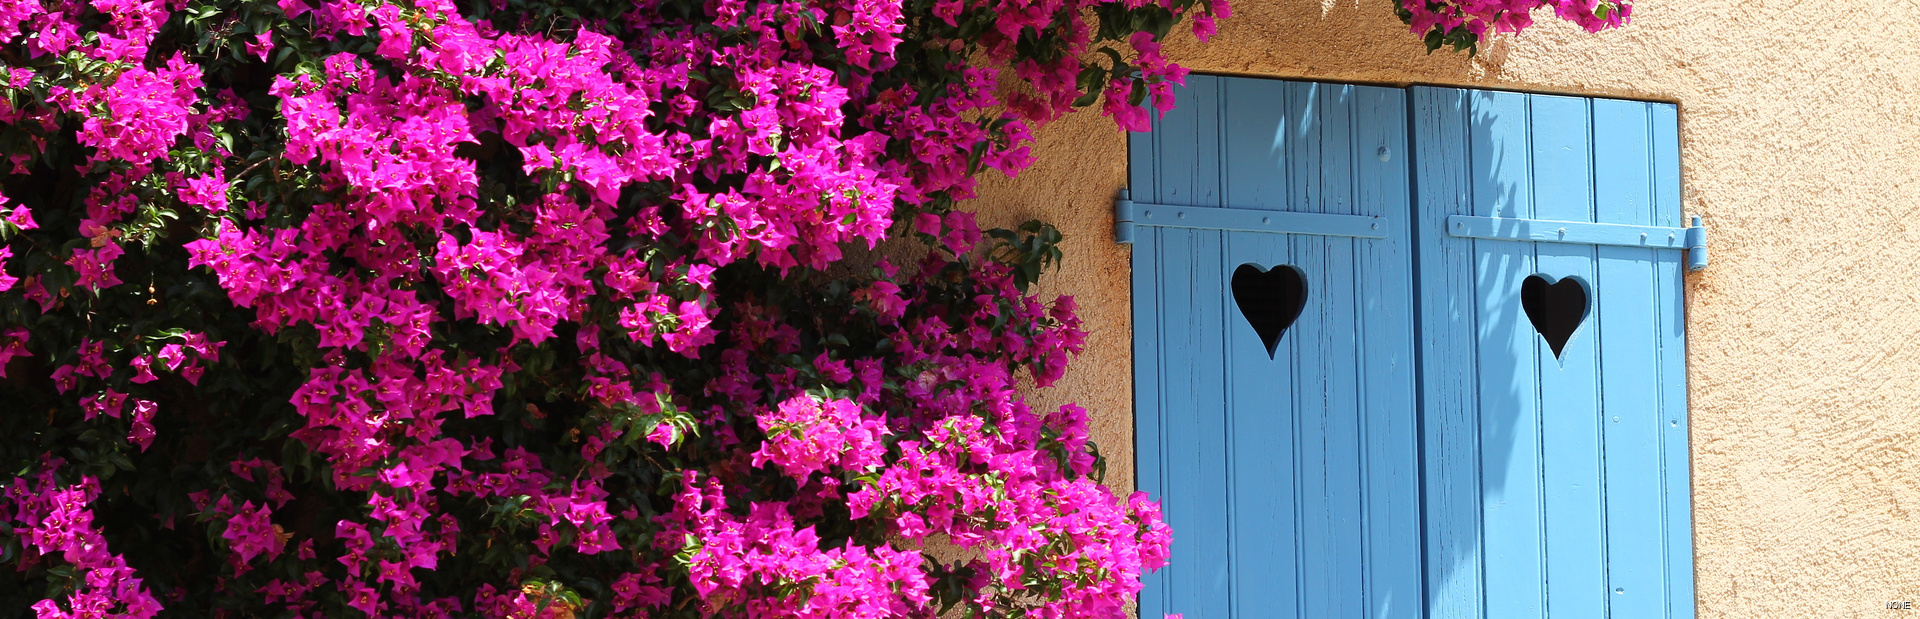 French Riviera news photo